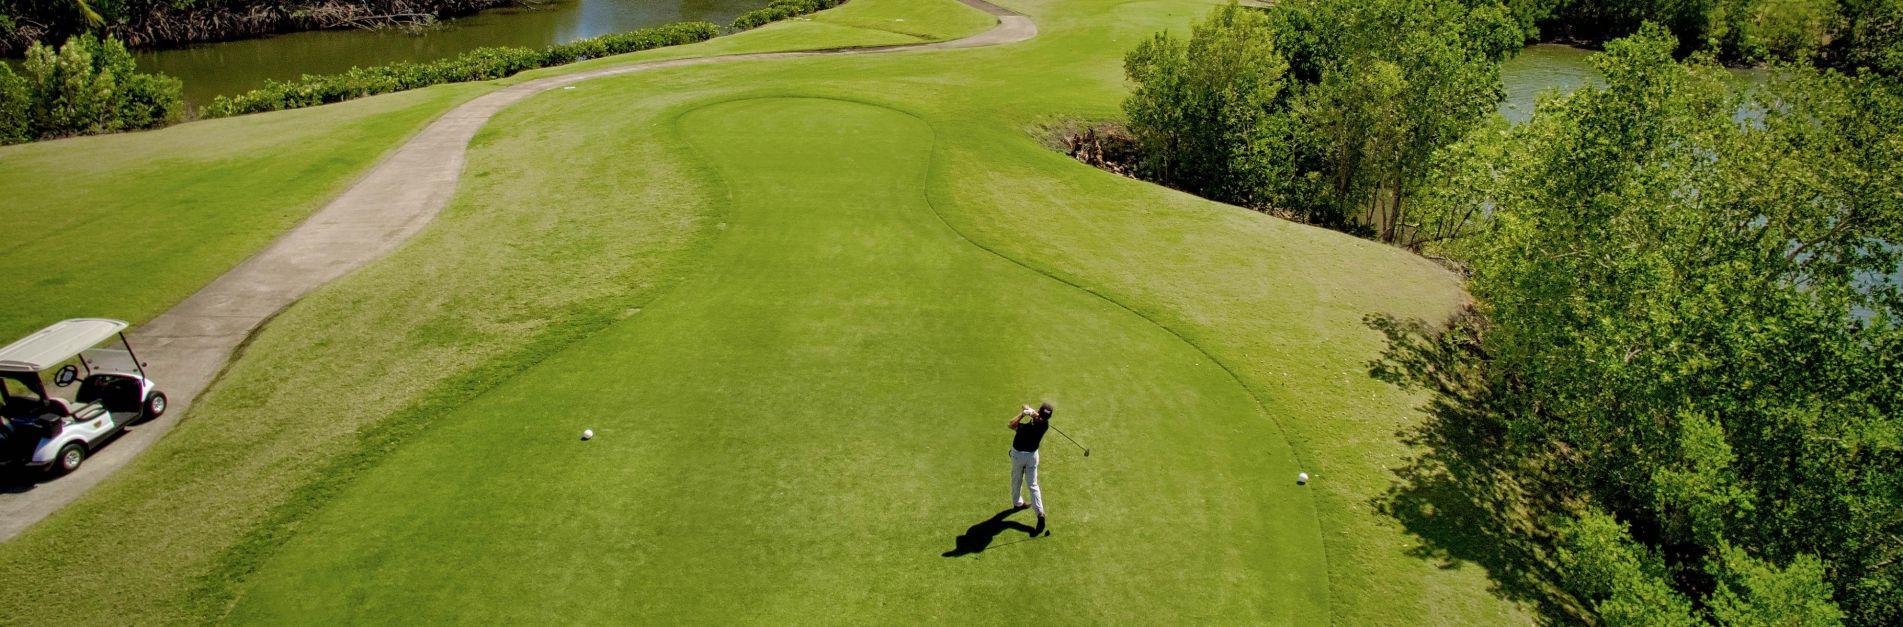 80-07082020104927-14-968-3974-1309-1903x627-cropped-sheraton-mirage-golf-course-port-douglas